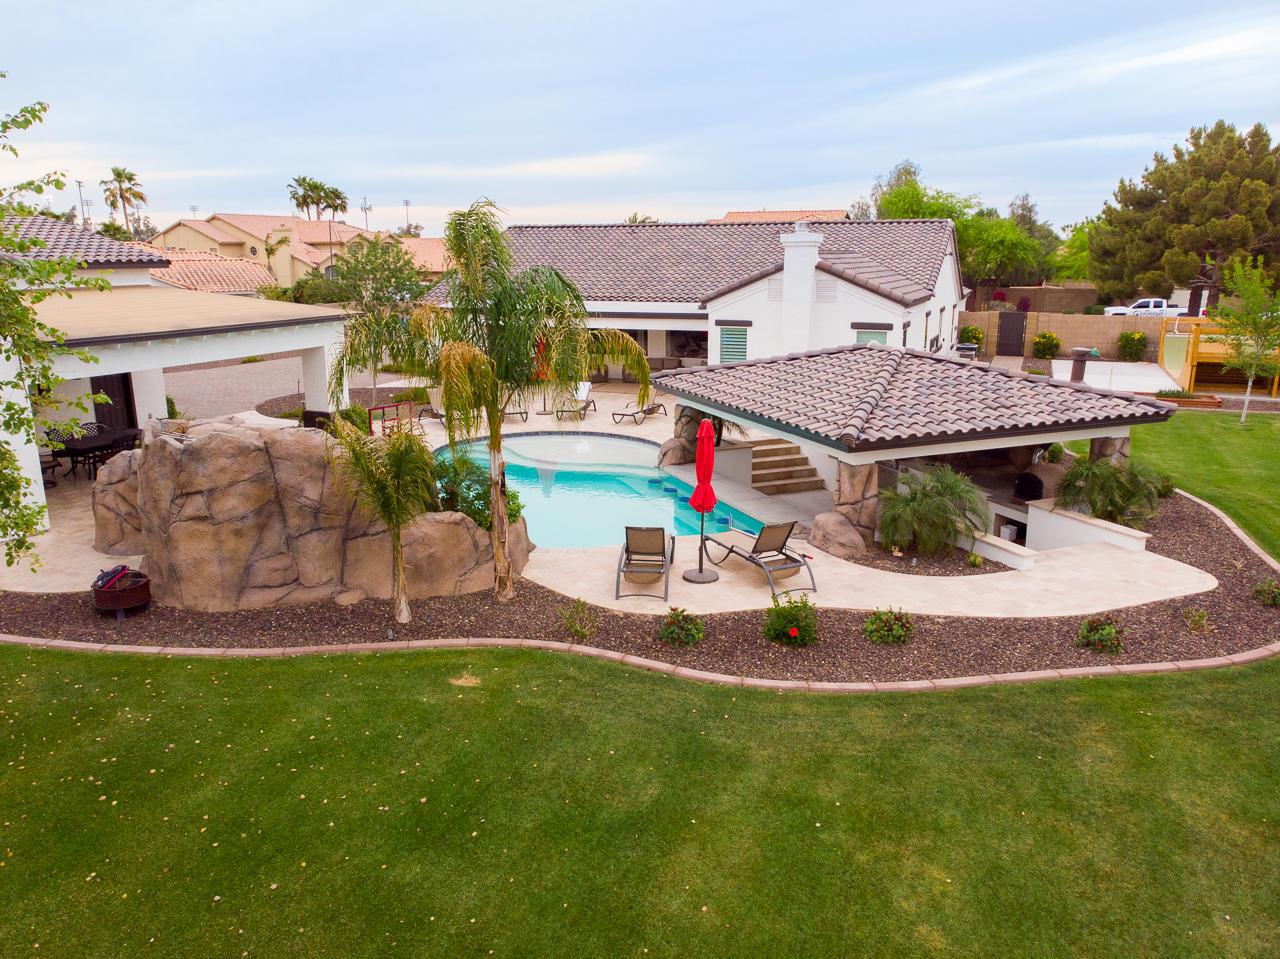 1241 PALO BLANCO Way, Gilbert, Arizona 85296, 4 Bedrooms Bedrooms, ,2.5 BathroomsBathrooms,Residential,For Sale,PALO BLANCO,6228006